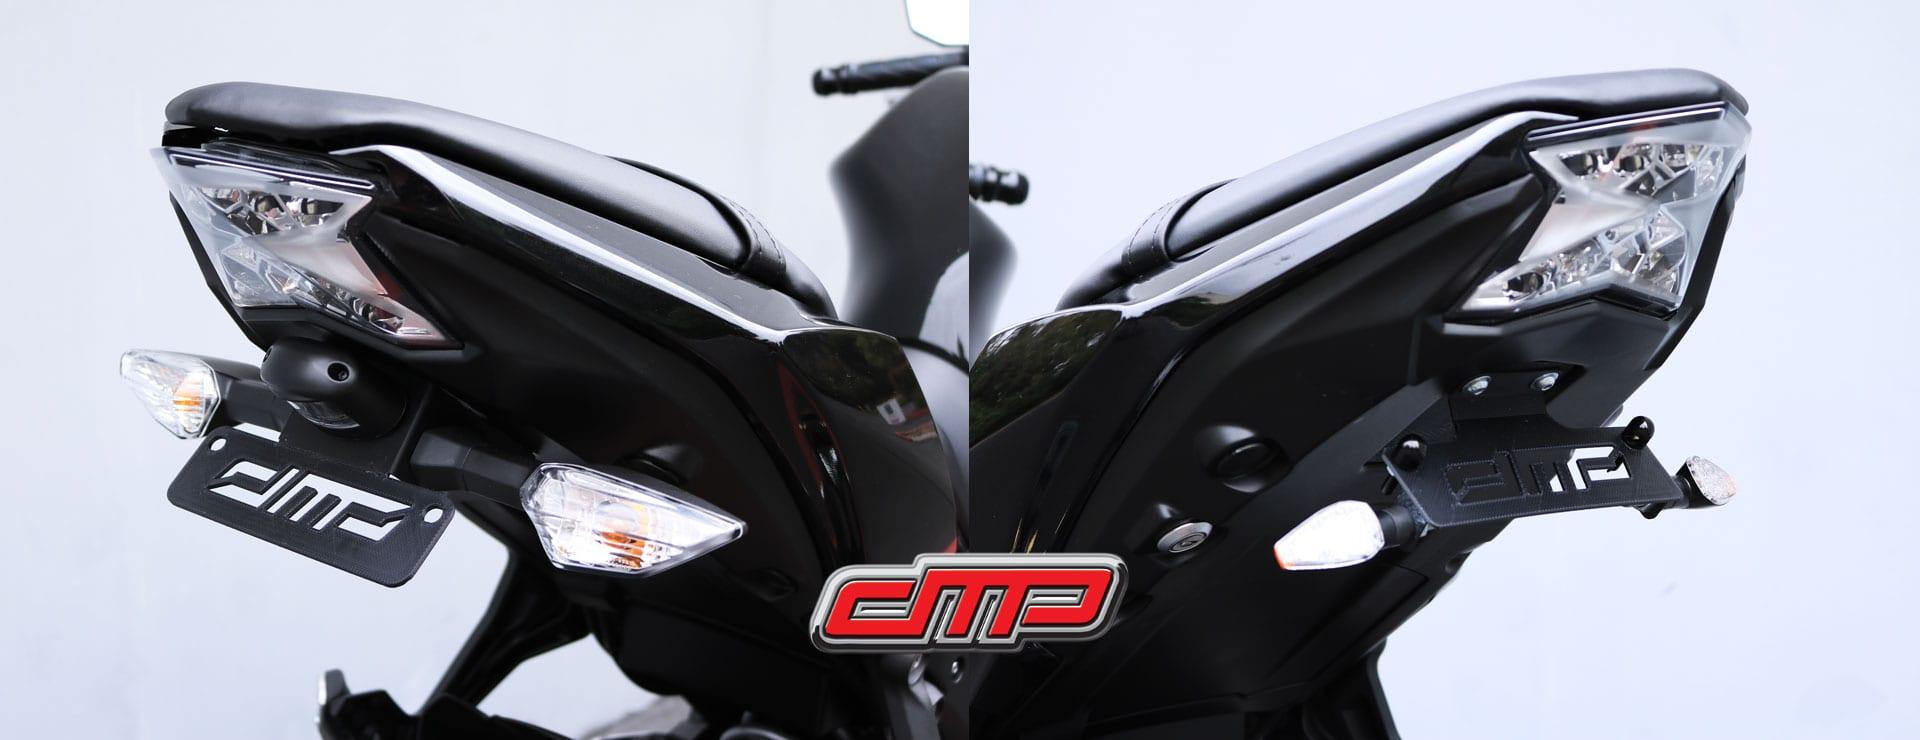 Ninja-650-DMP-Banner